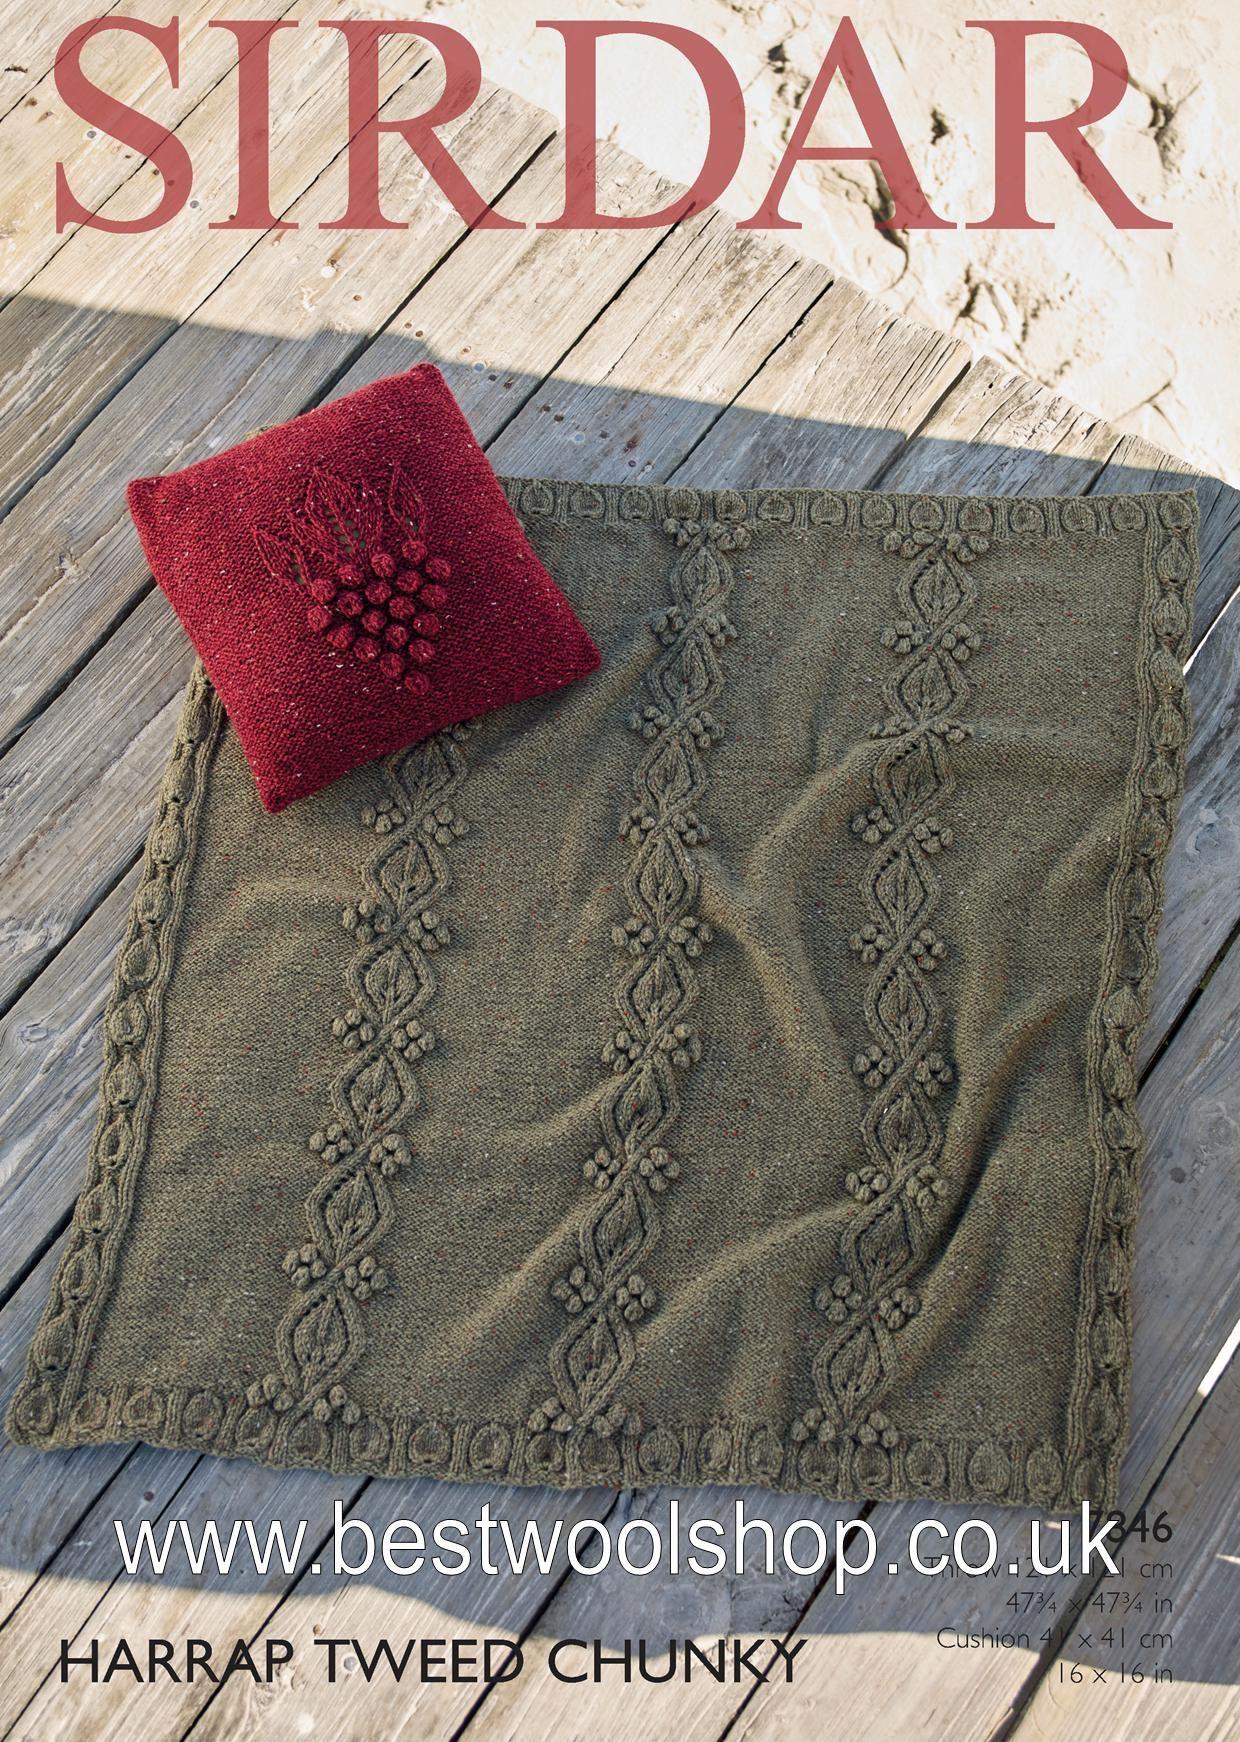 Book Cover Knitting Pattern ~ Sirdar harrap tweed chunky cushion cover throw knitting